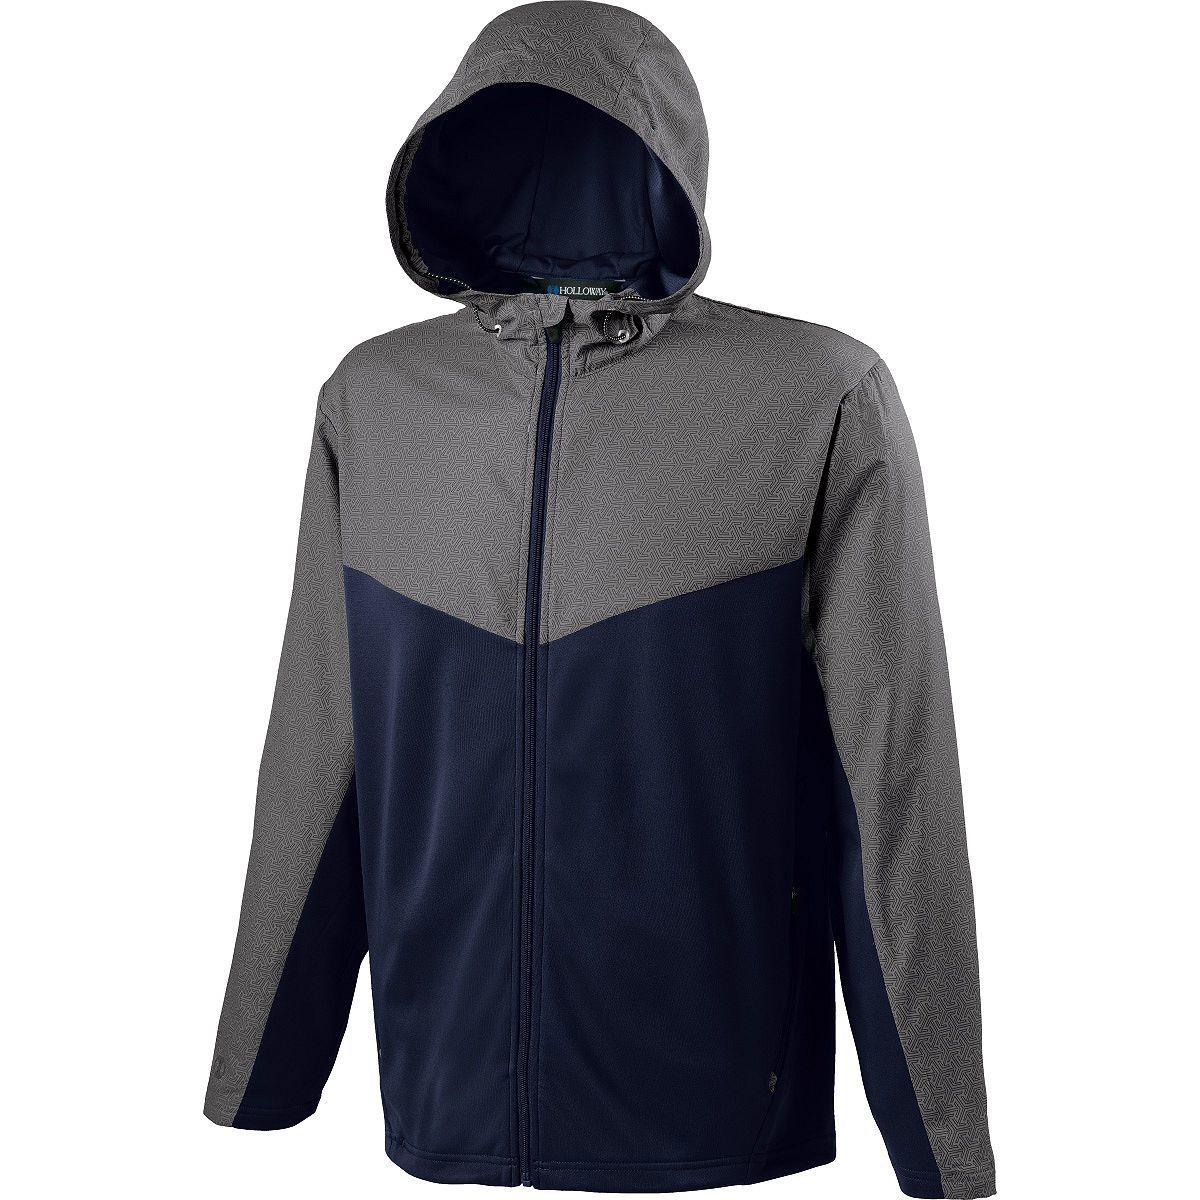 Adult Crossover Jacket - GREY PRINT/NAVY